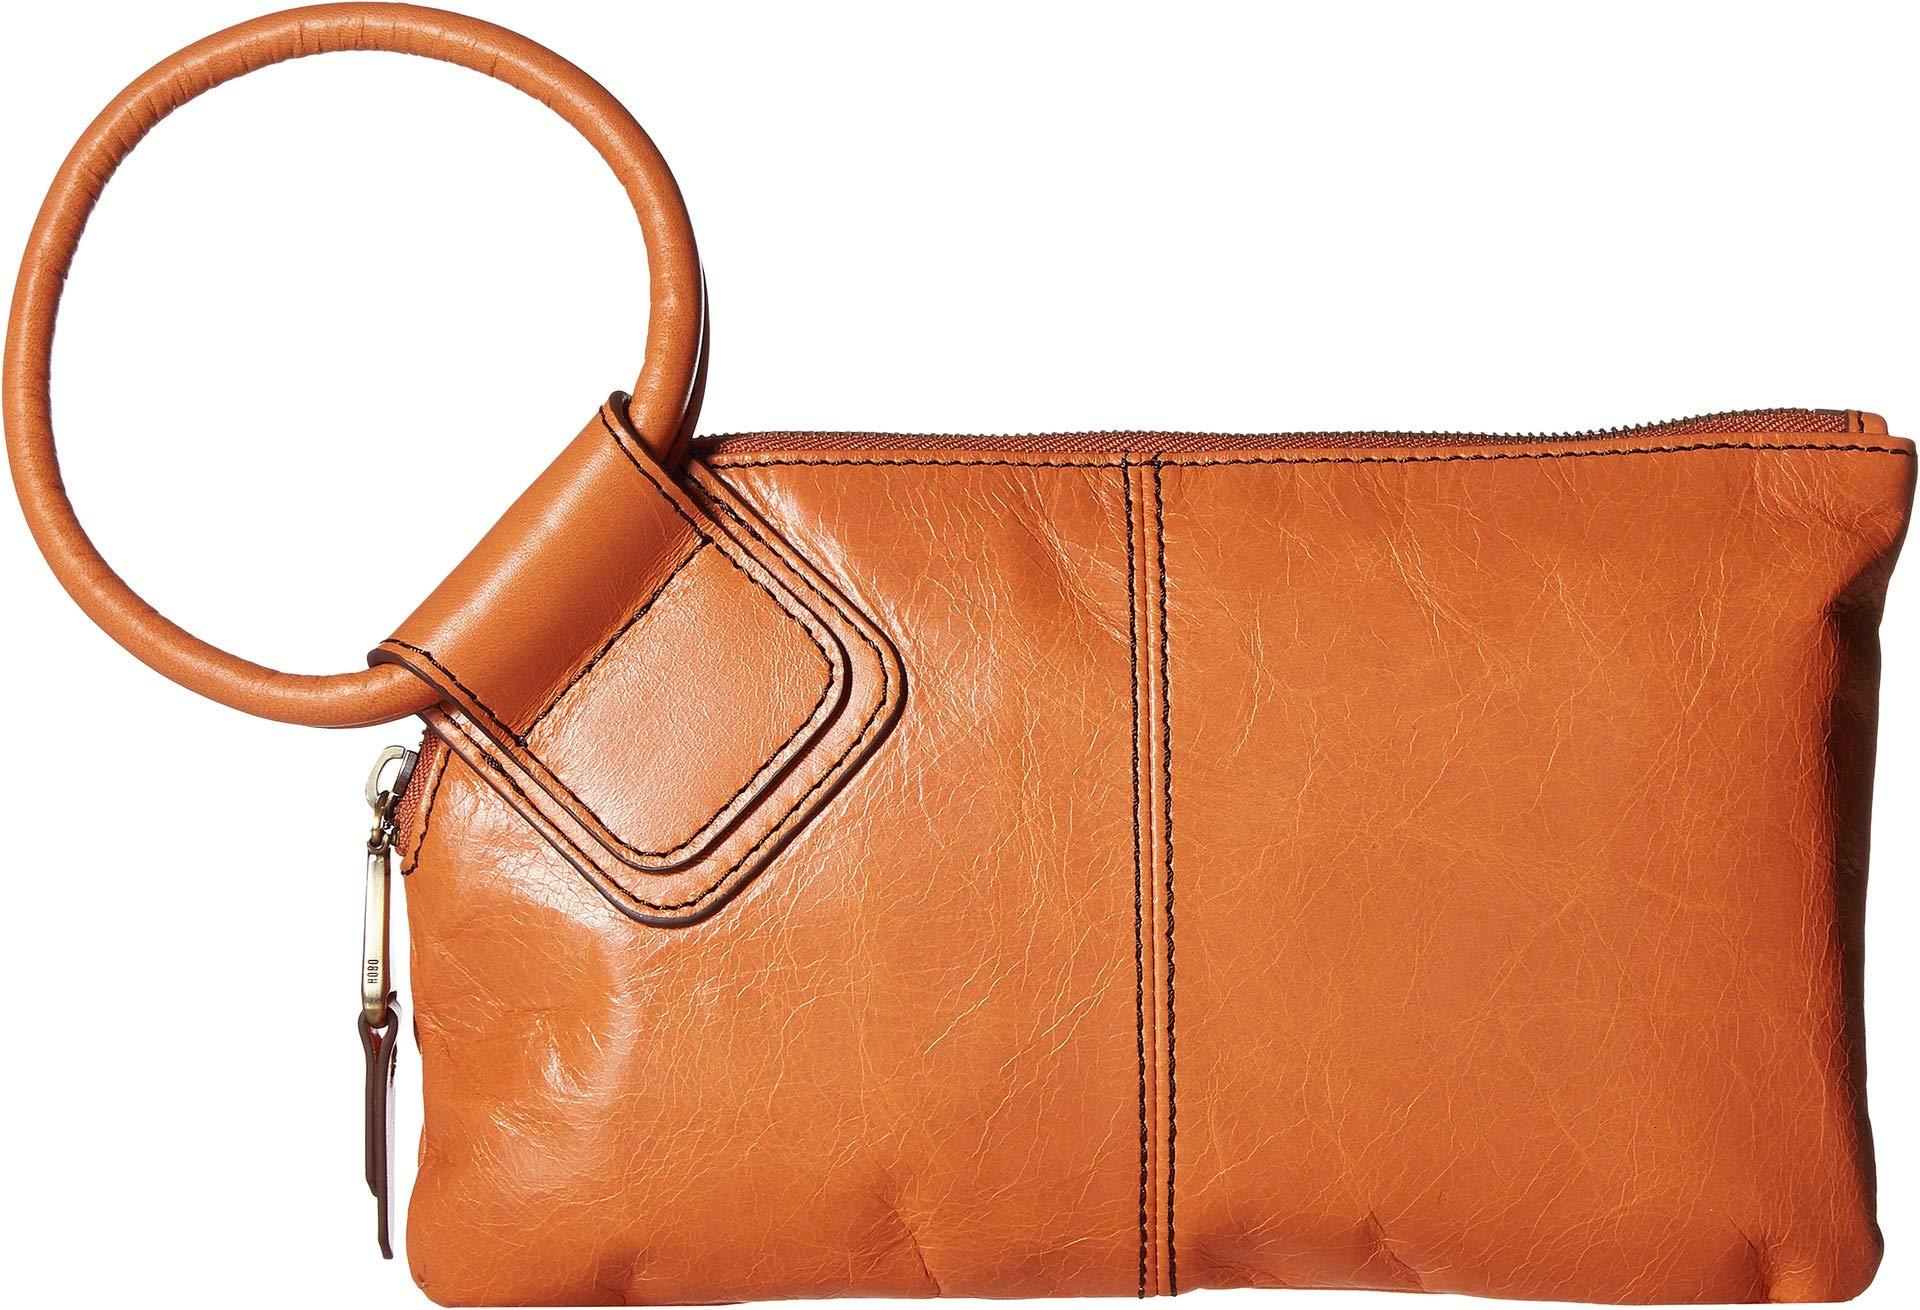 Hobo Women's Leather Sable Wristlet Clutch Wallet (Dusty Coral)